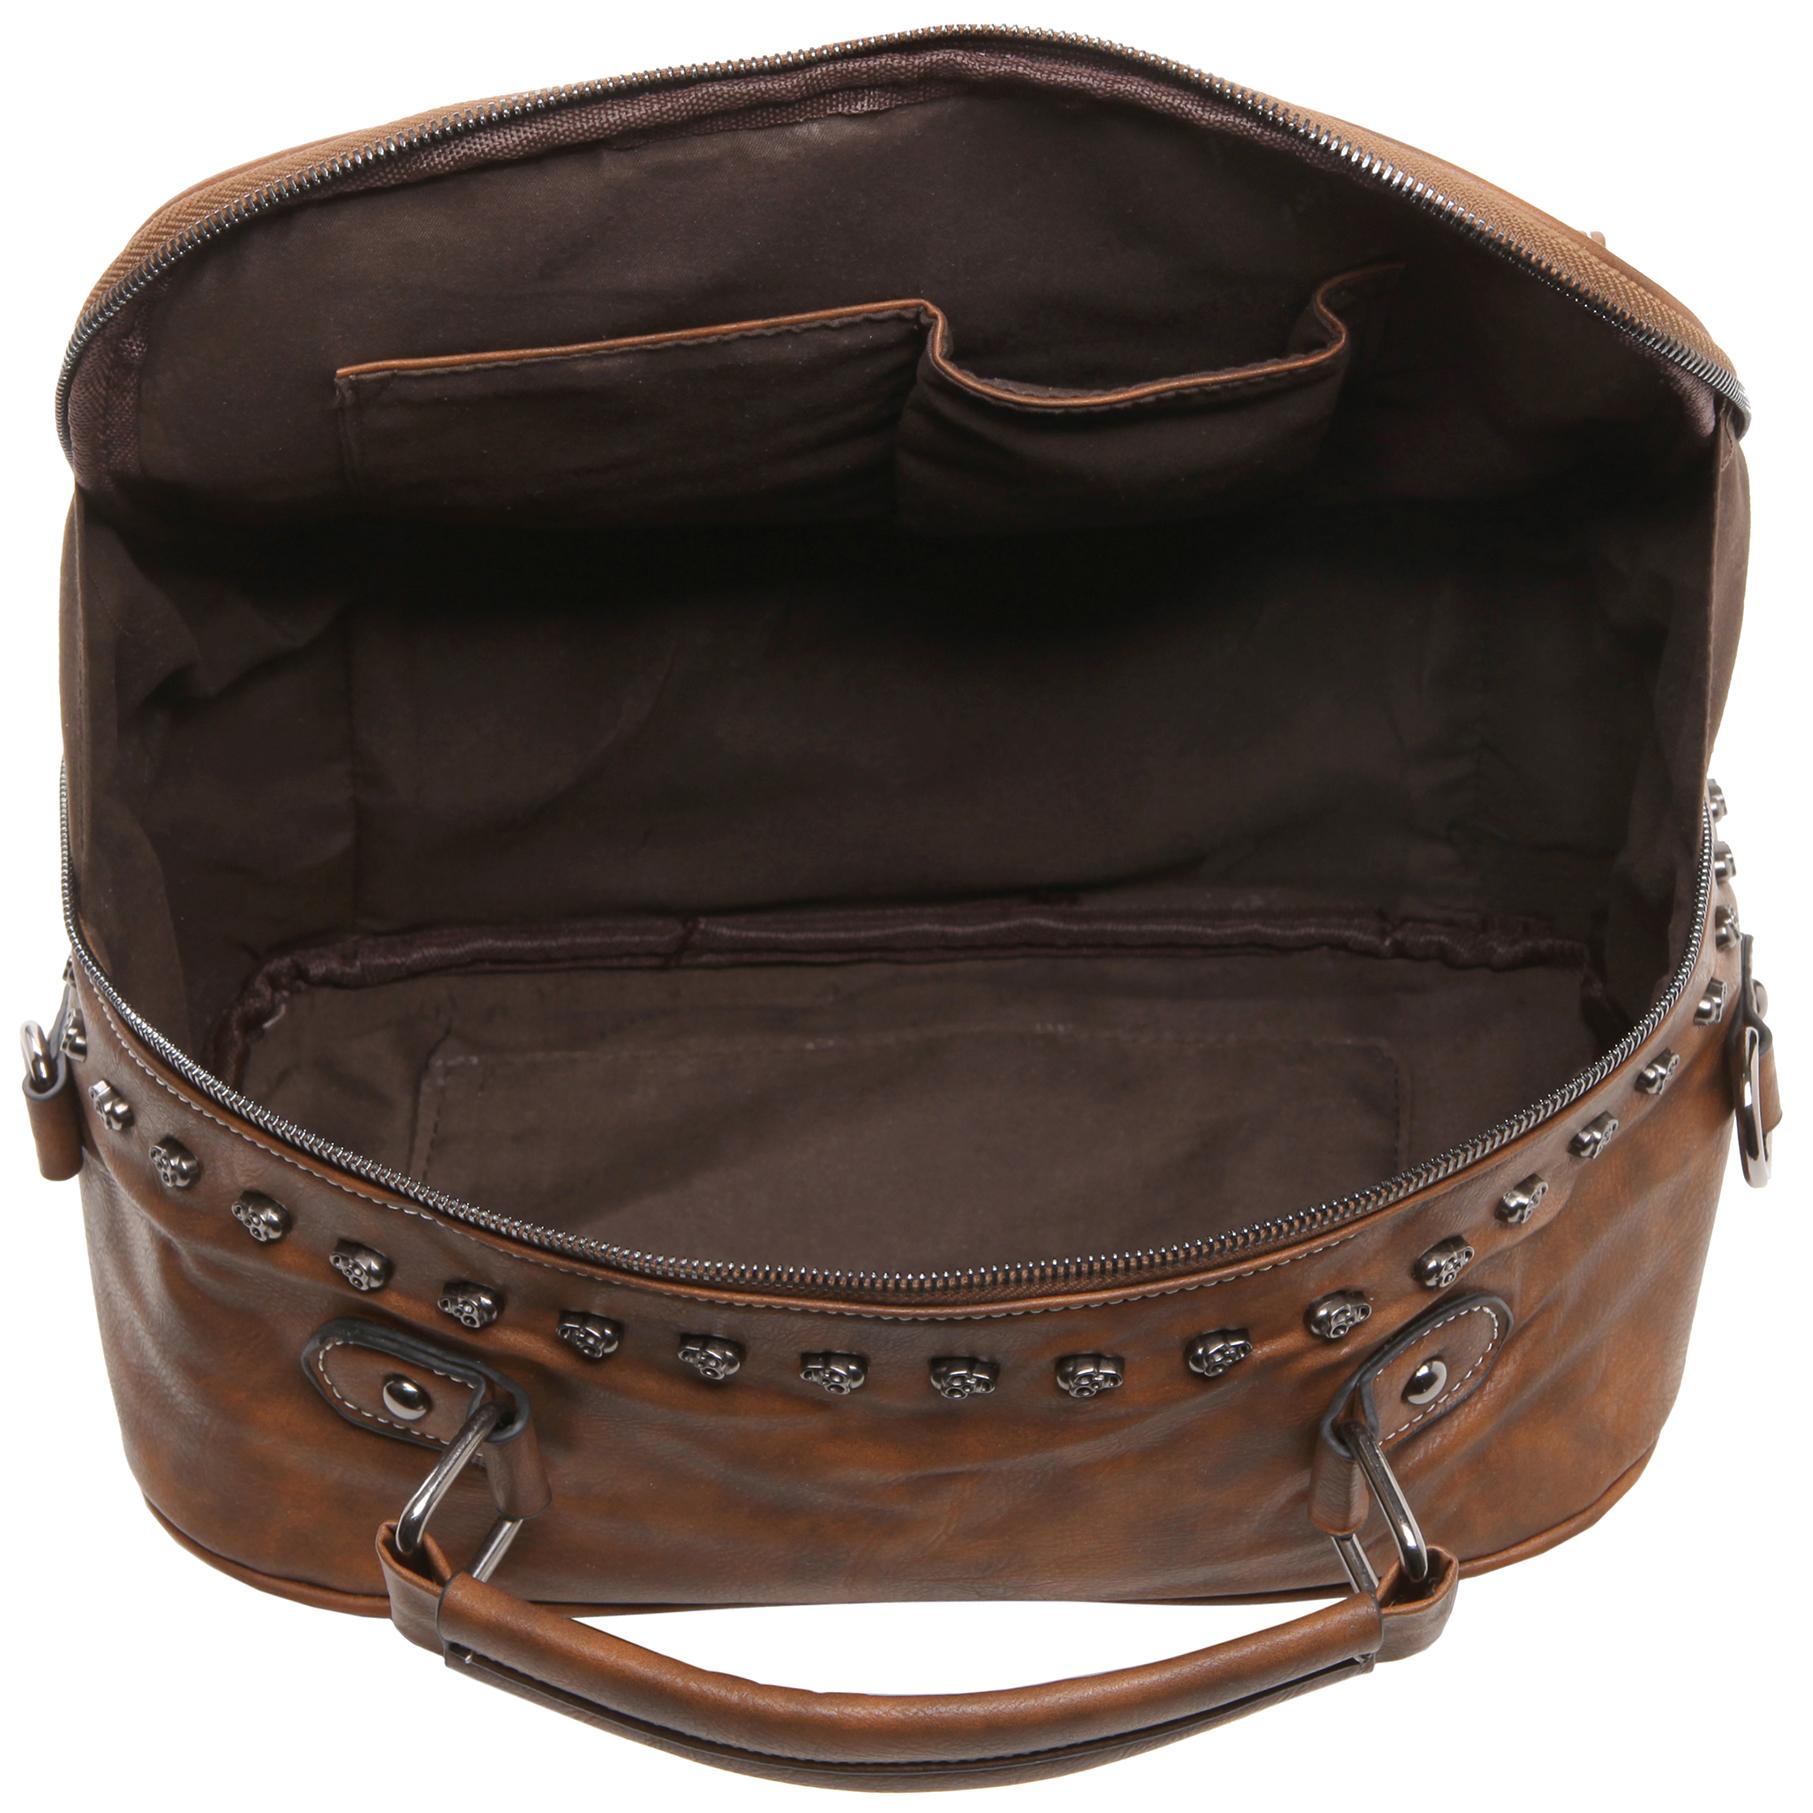 Women's Designer Handbag MASON in Brown Gothic Style Satchel open image